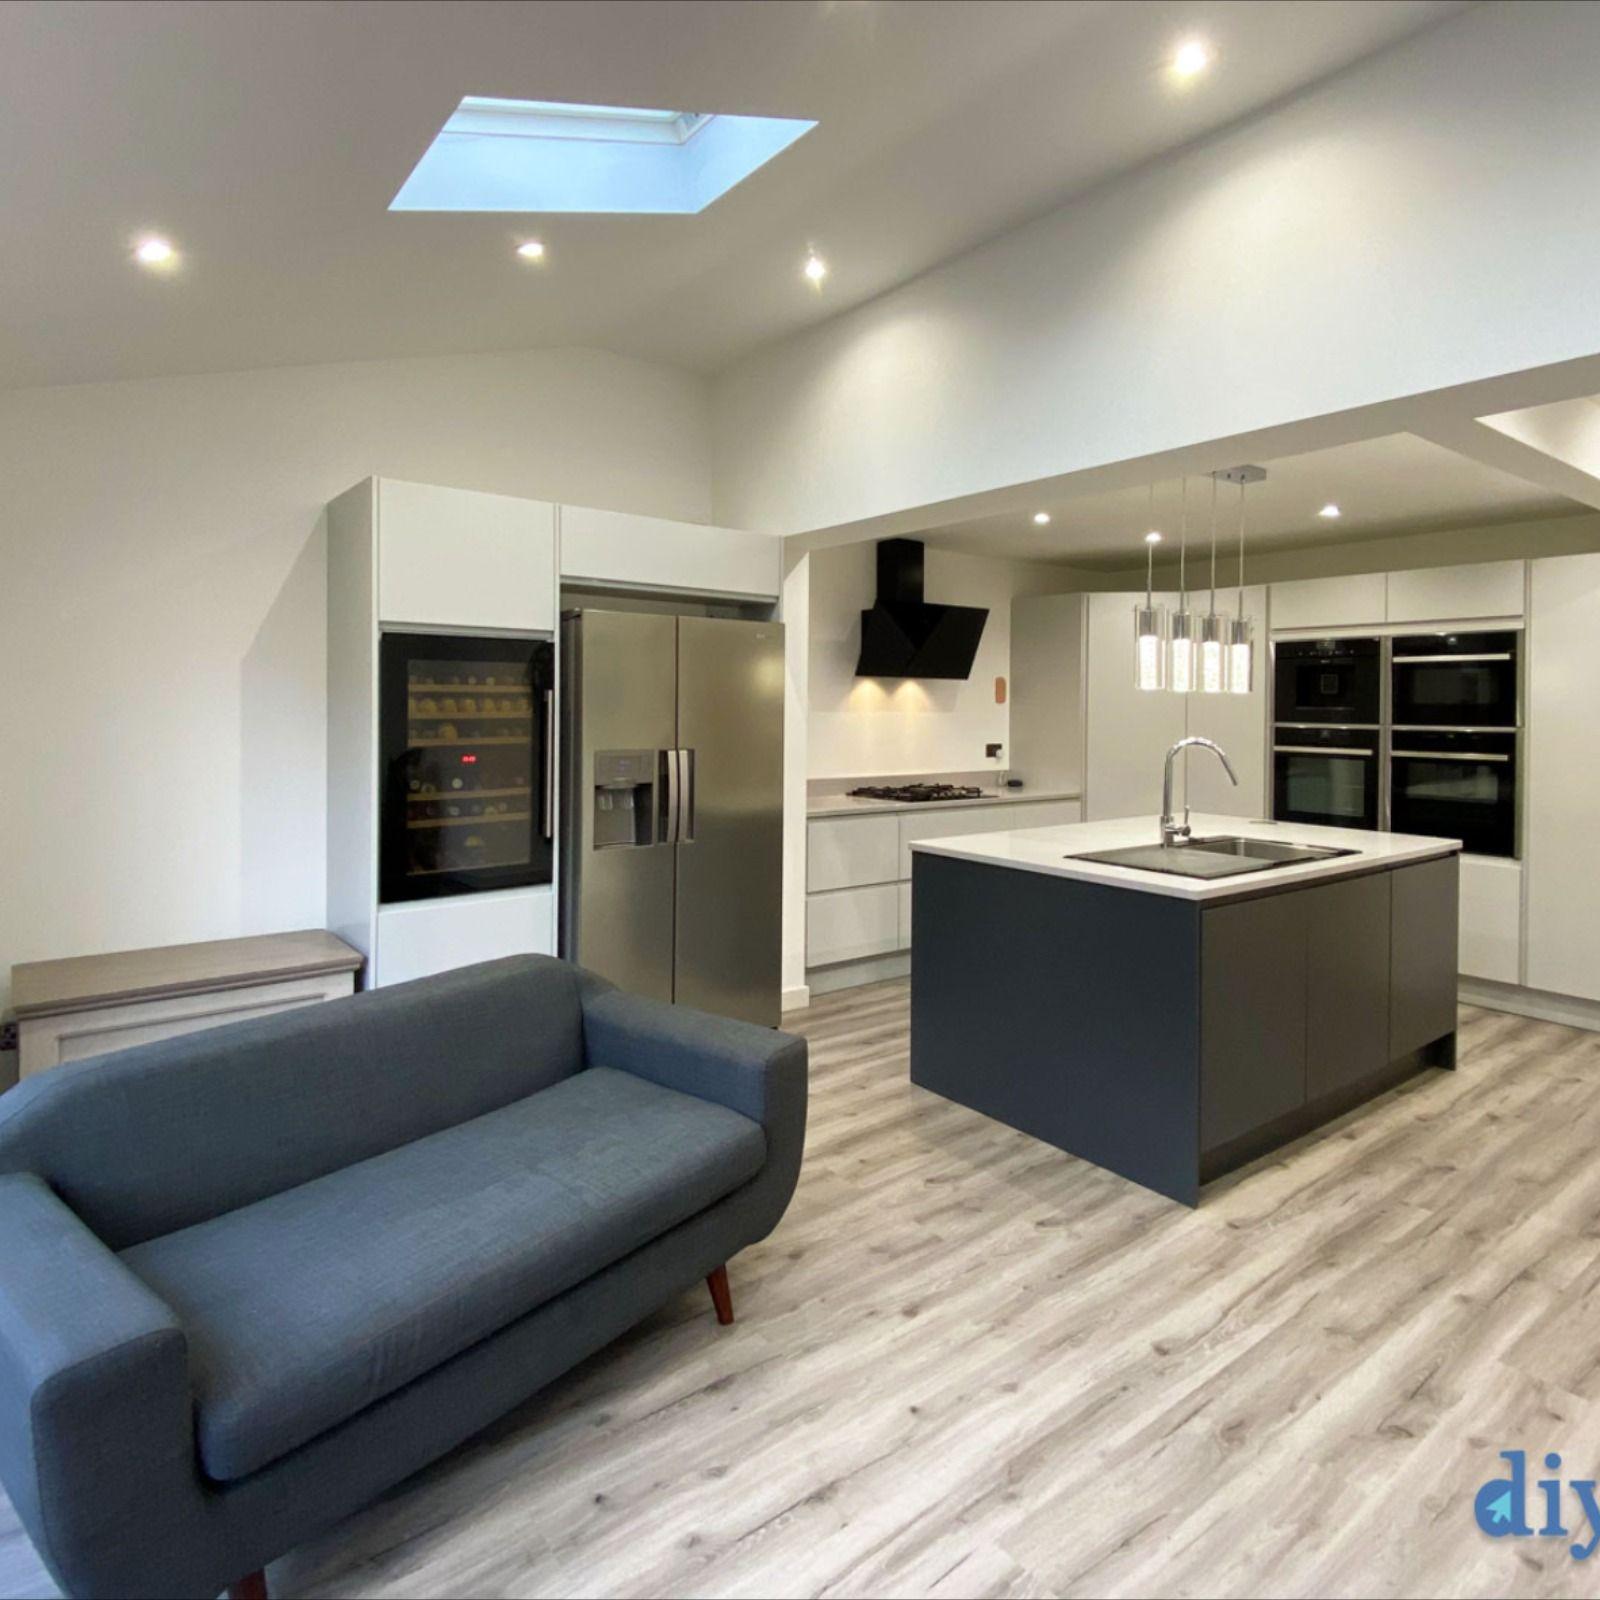 Best An Innova Luca Dove Grey Handleless Kitchen In 2020 400 x 300